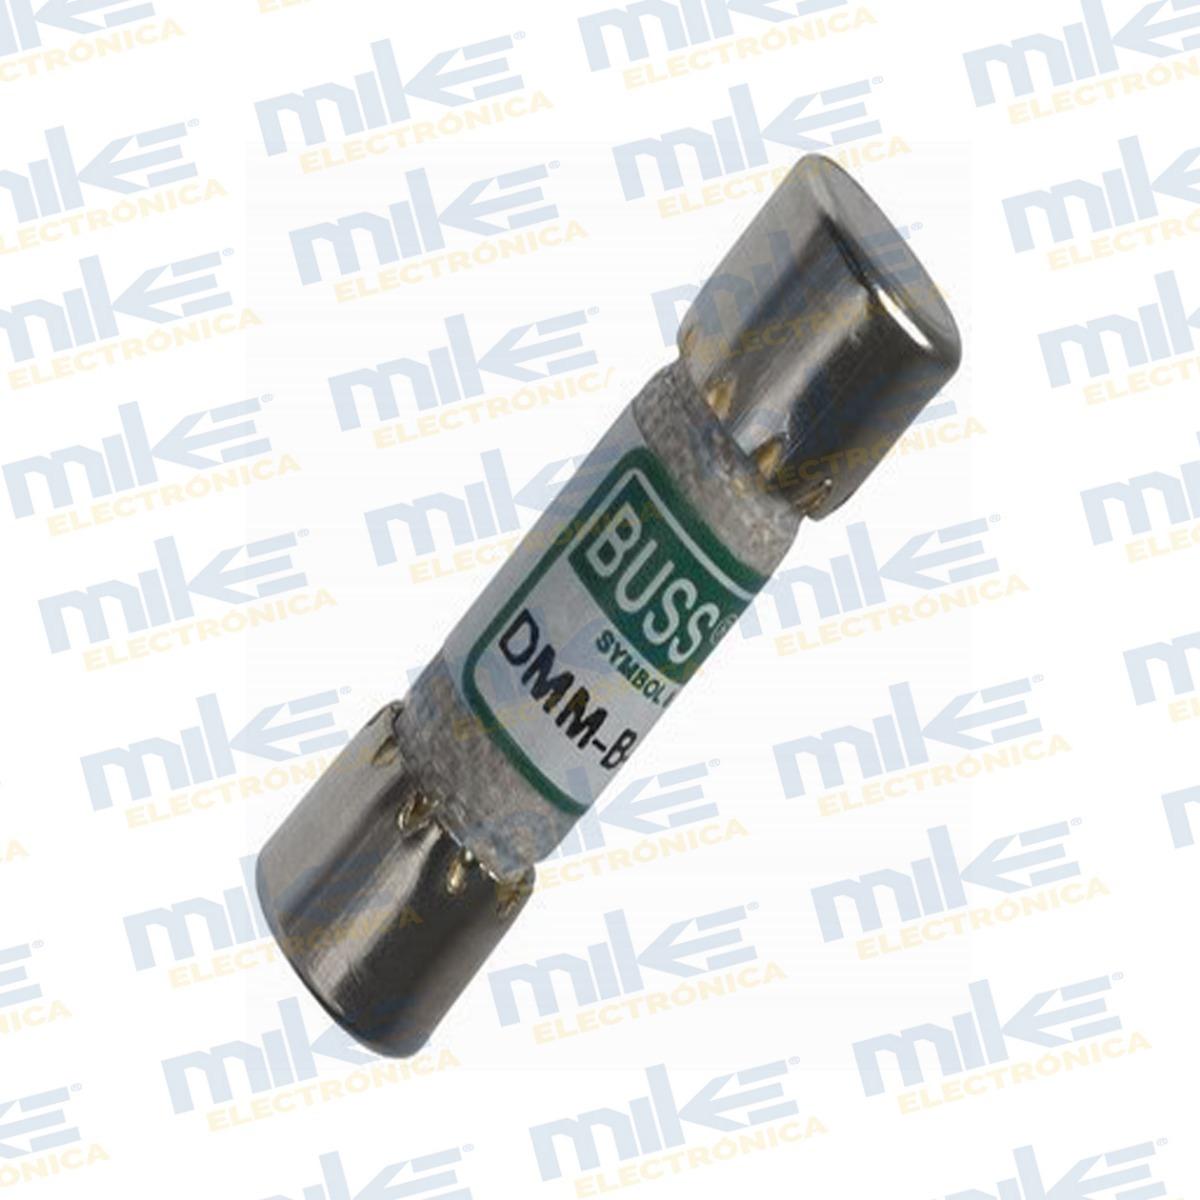 = 4,98 € Point LED lyp47f SMD amarillo 50 St Yello 590nm OSRAM ly p47f-v1-4-3b-30